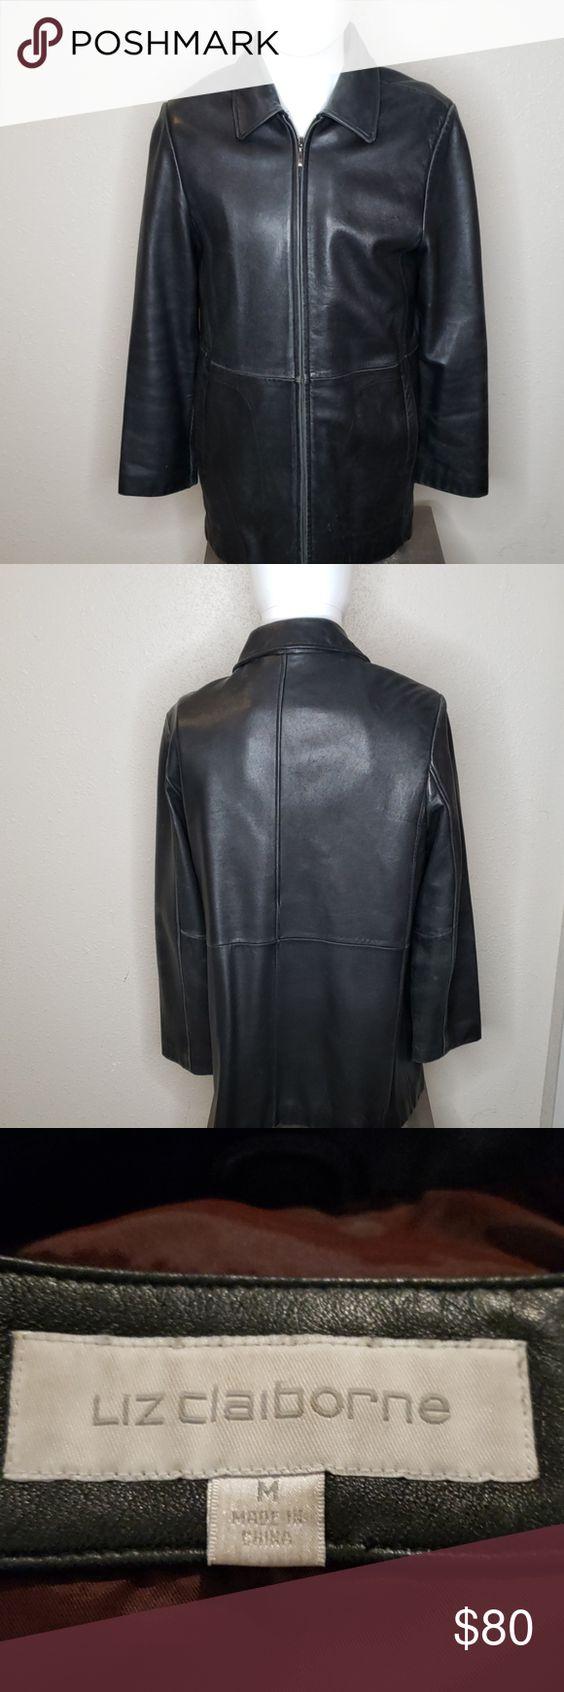 Liz Claiborne 100 Genuine Leather Jacket In 2020 Genuine Leather Jackets Distressed Leather Jacket Brown Leather Jacket Men